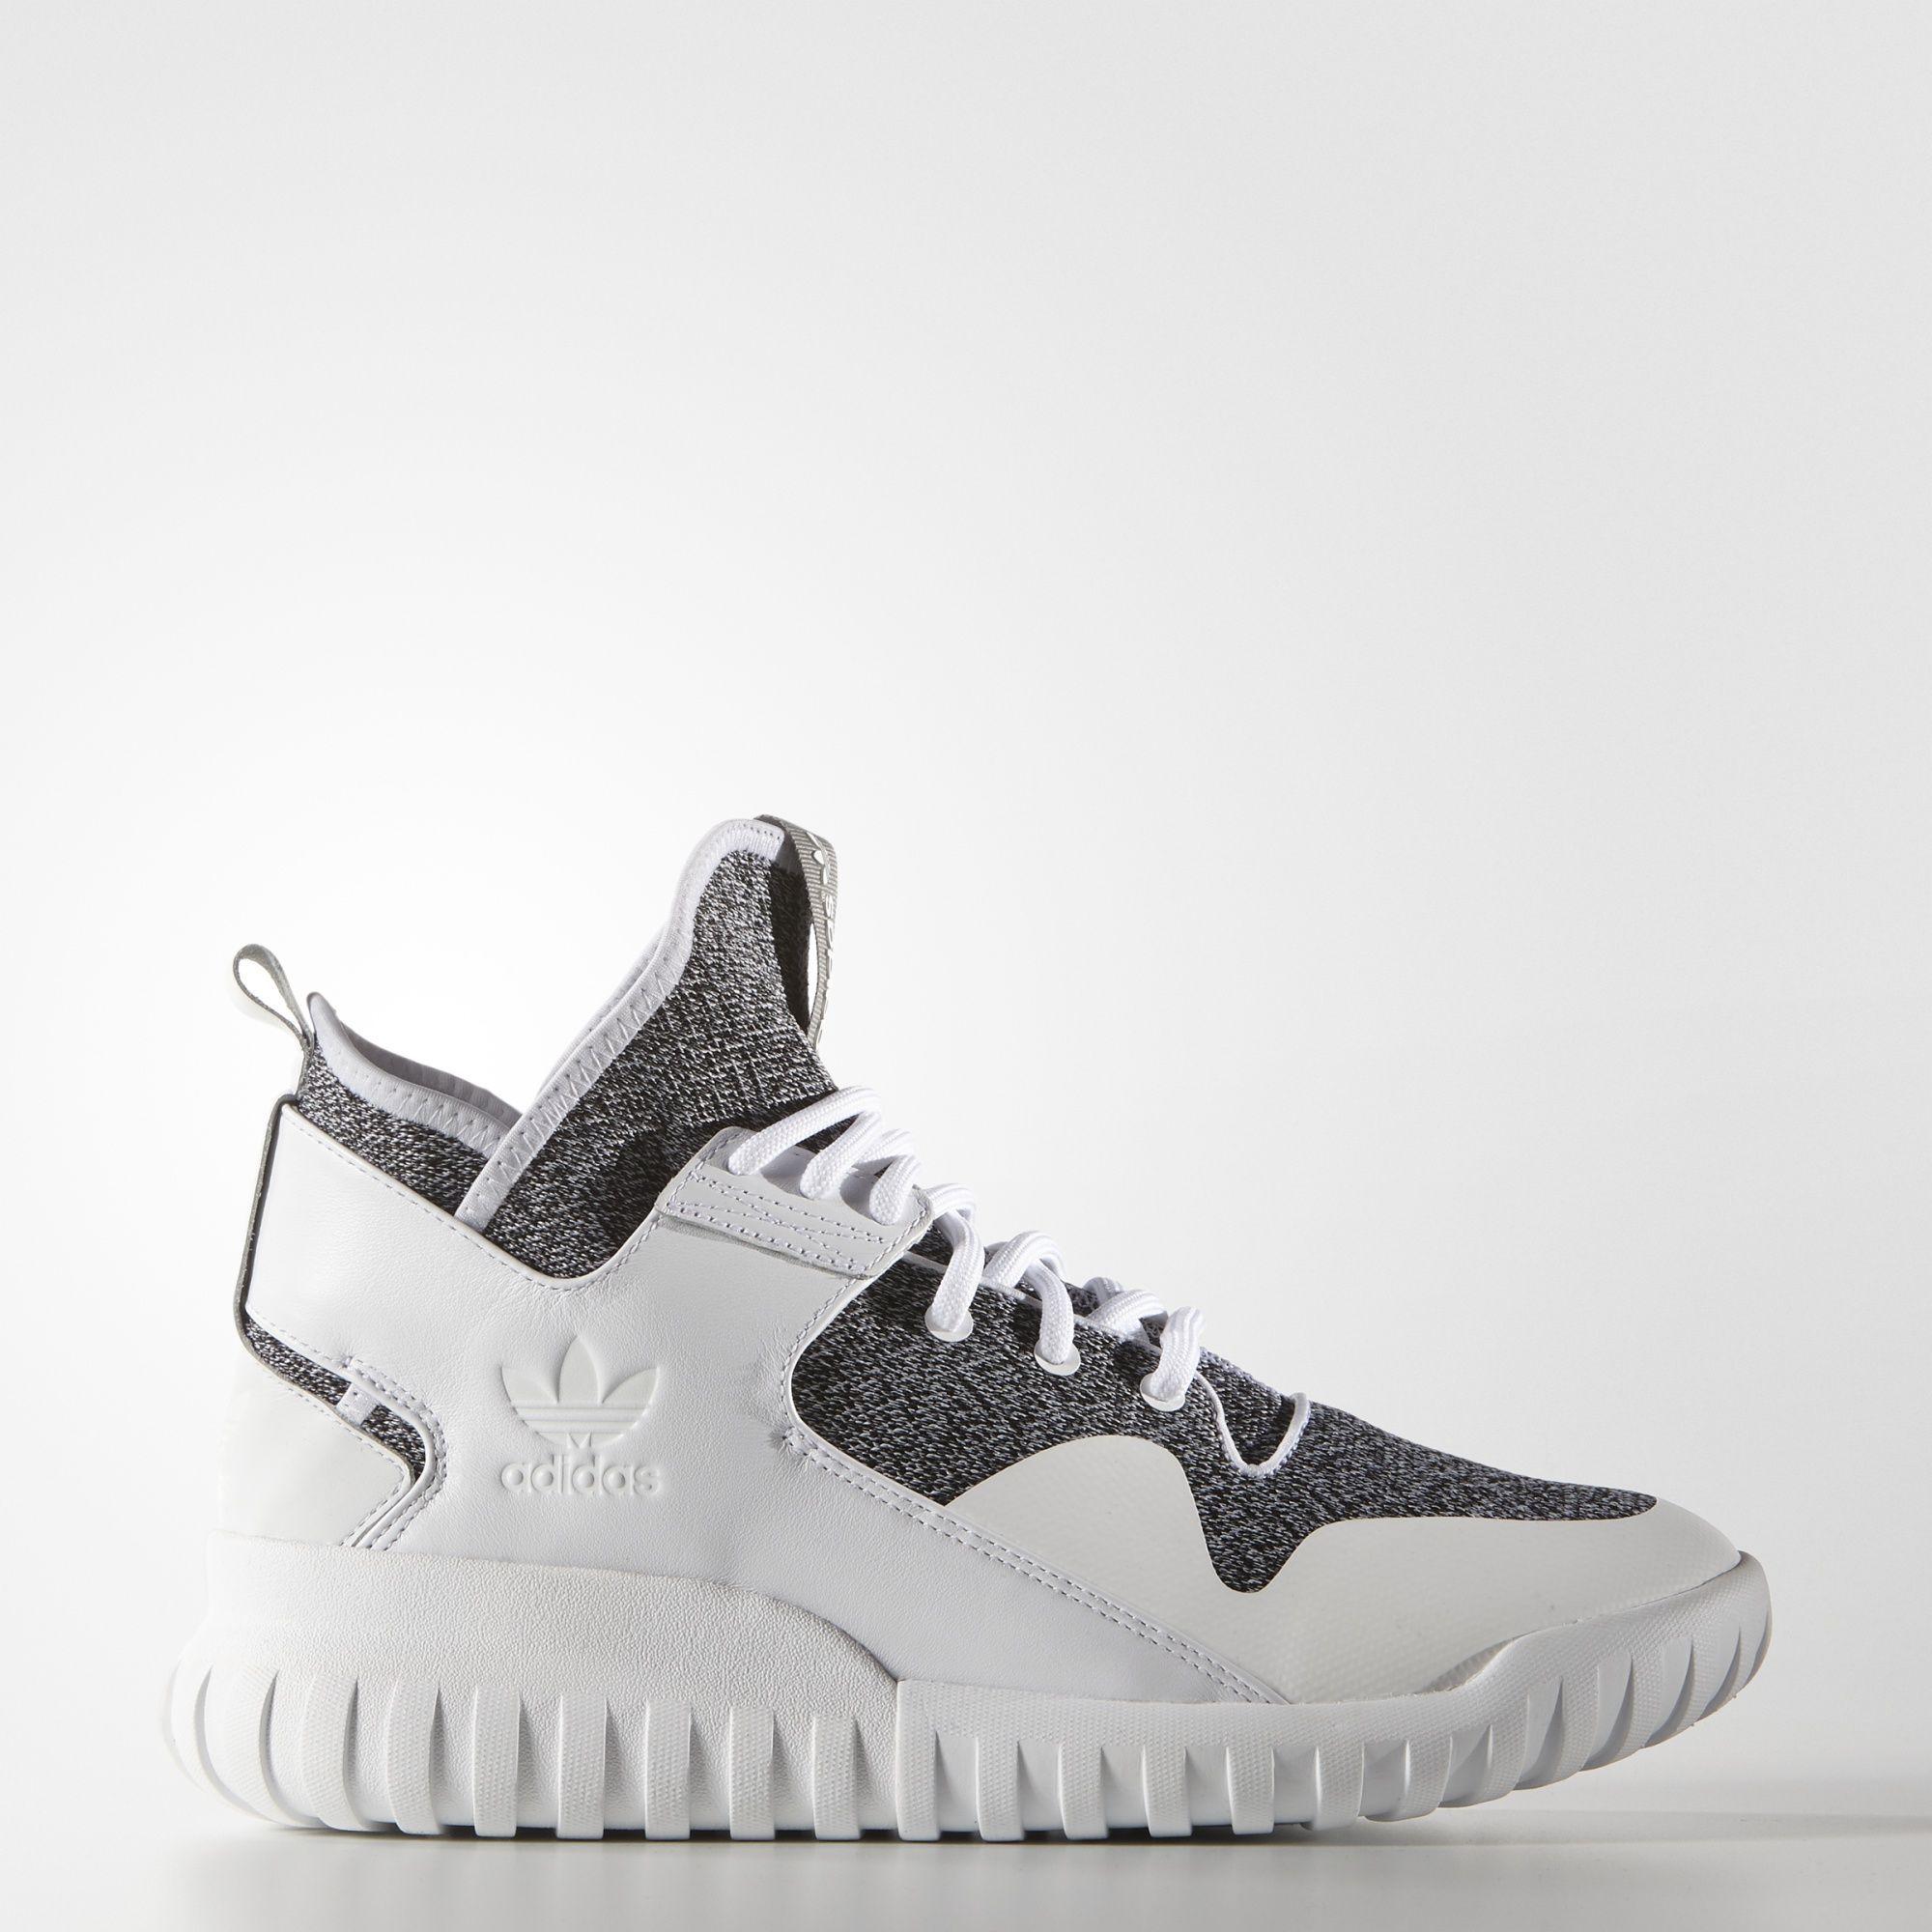 Cheap Adidas Tubular Doom PK in Black Getoutsideshoes